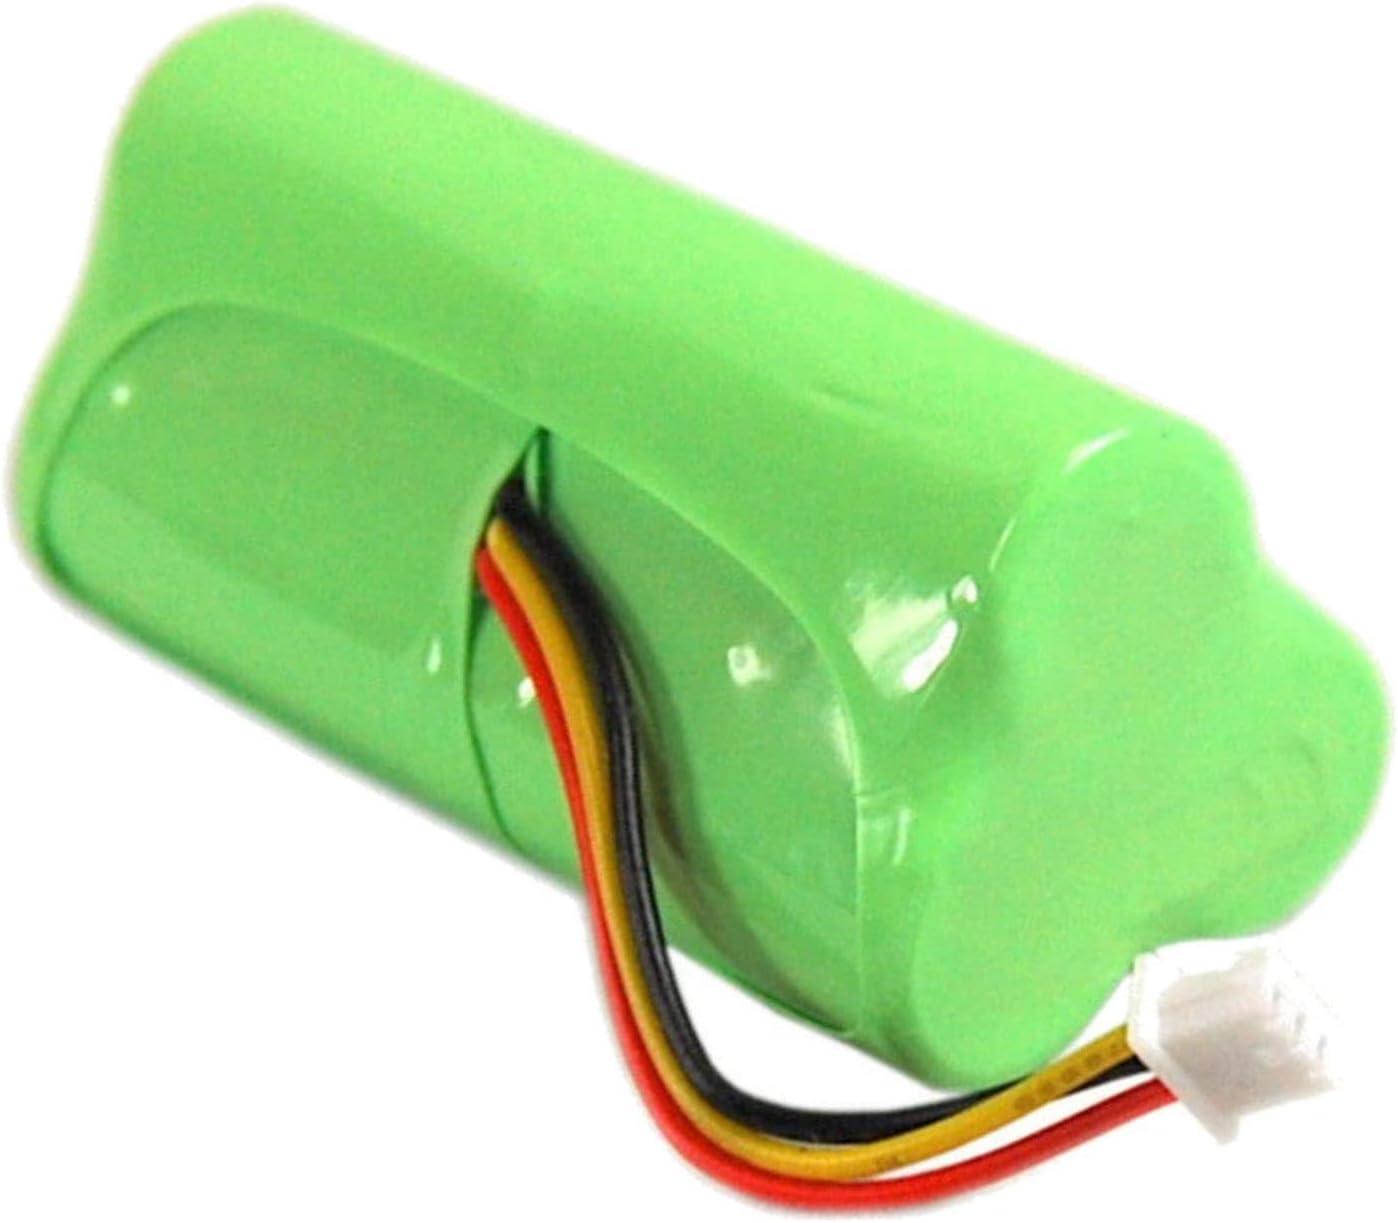 HQRP Bater/ía para Motorola Symbol LS4278 LS-4278 LS4278-M 82-67705-01 BTRY-LS42RAAOE-01 K35466 Lector//Esc/áner de c/ódigo de Barras inal/ámbrico